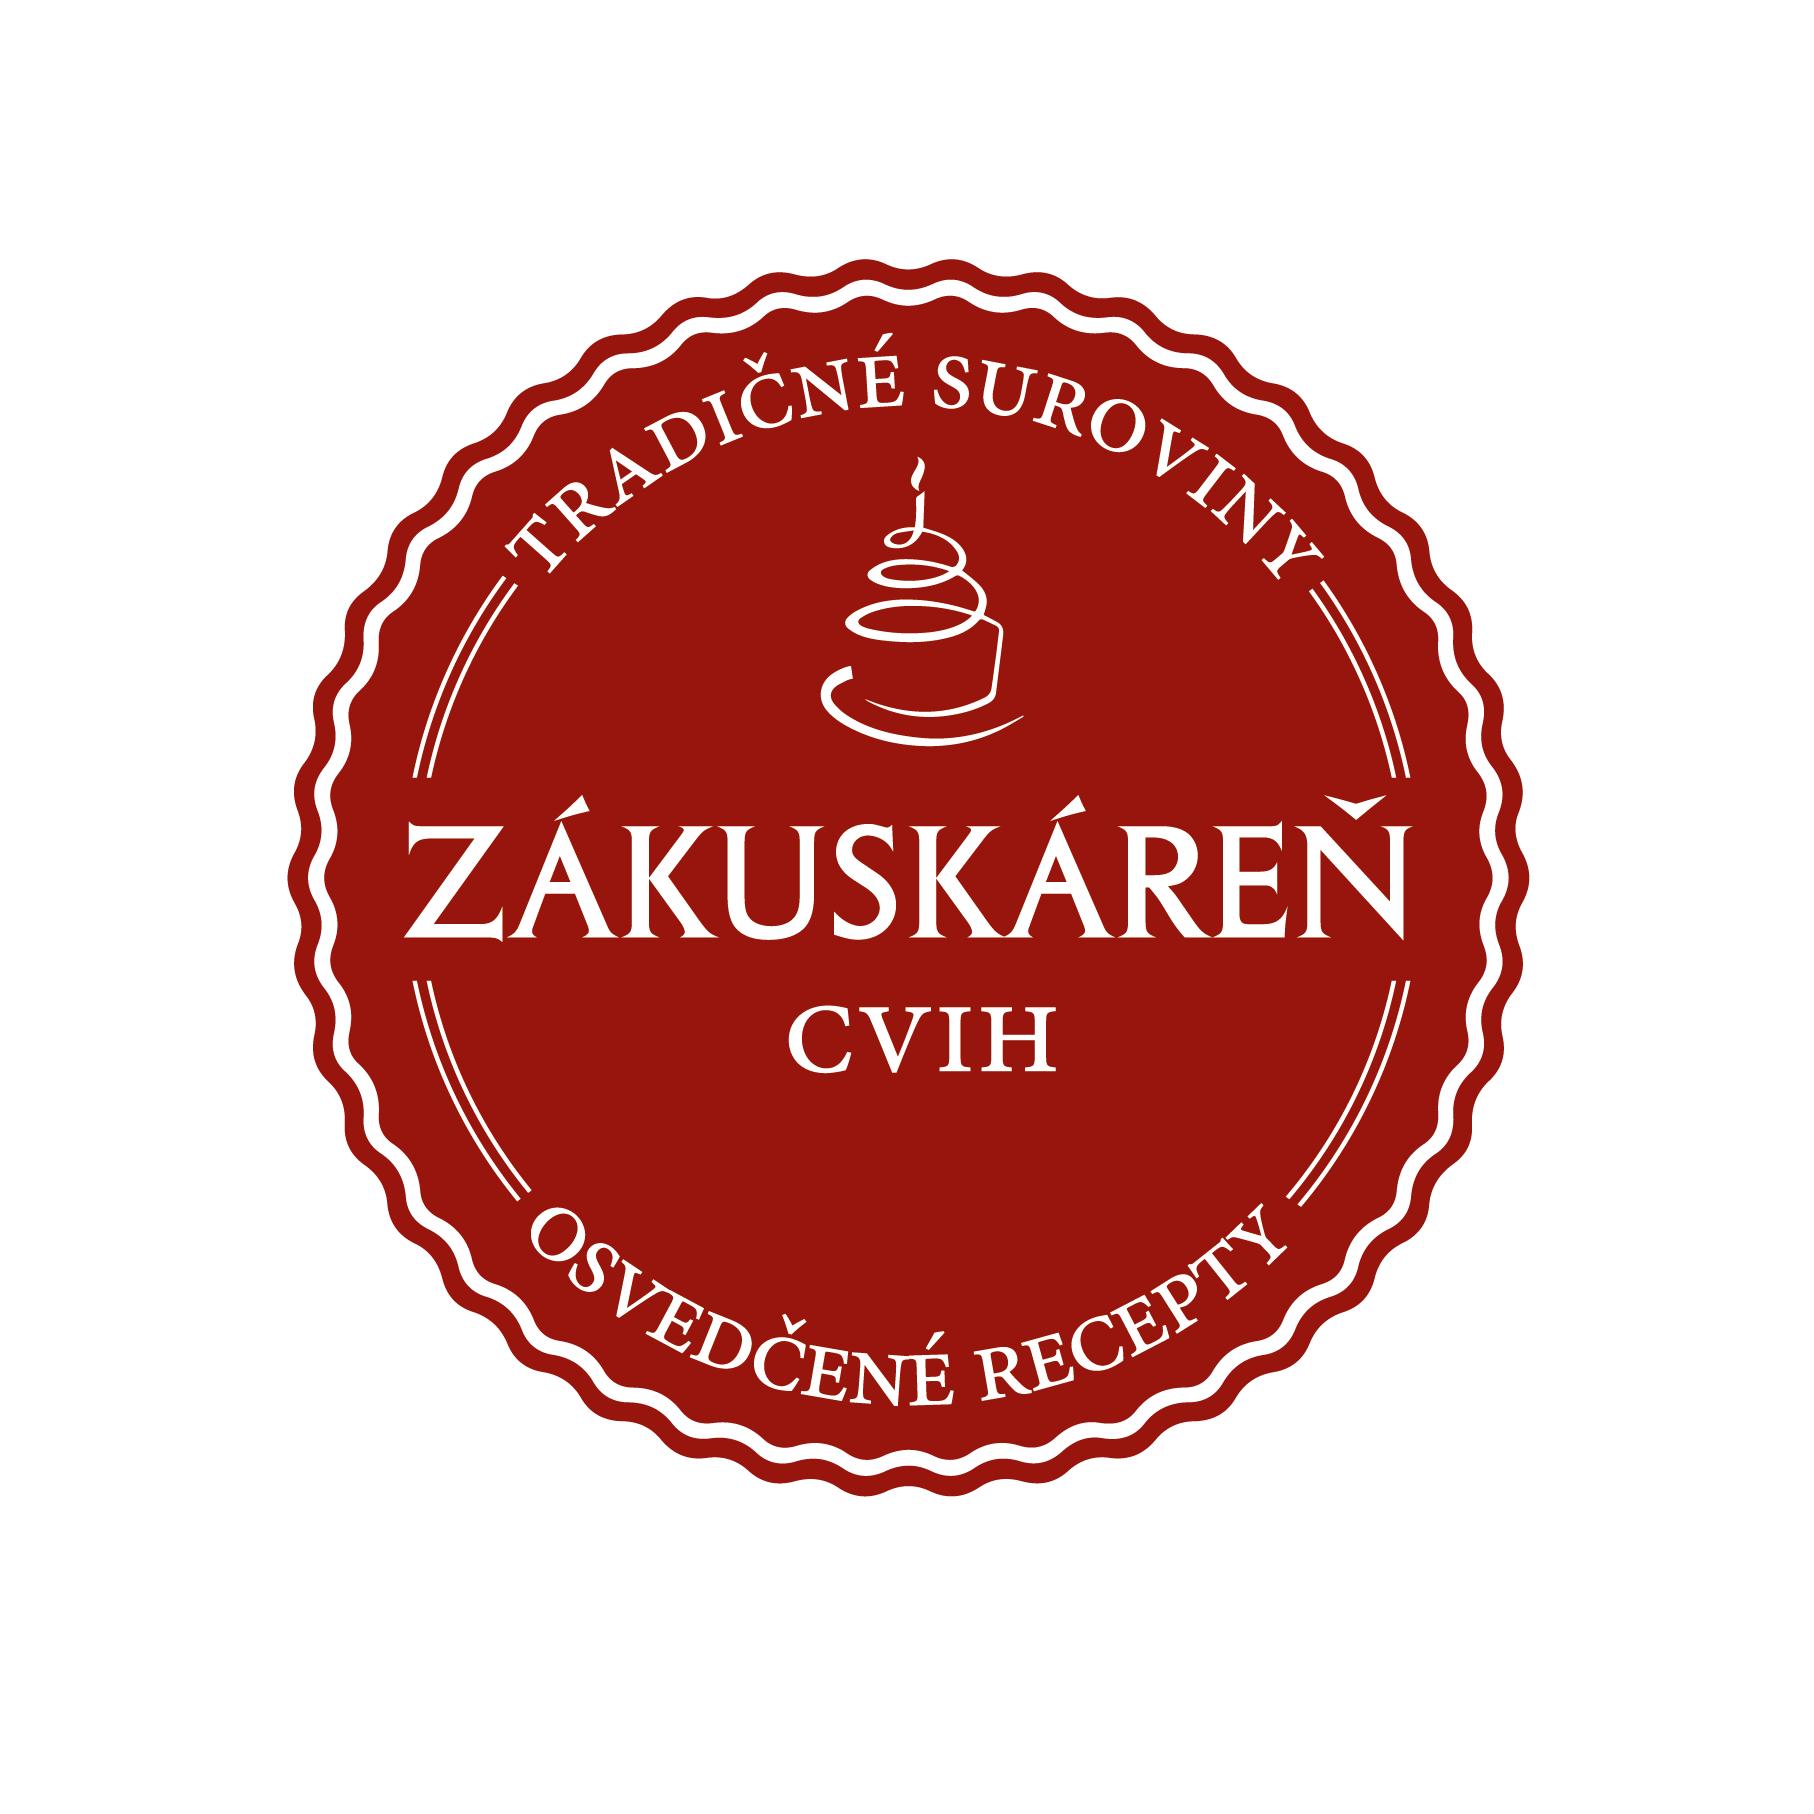 CUKRÁRSKA VÝROBA - CVIH, s.r.o.